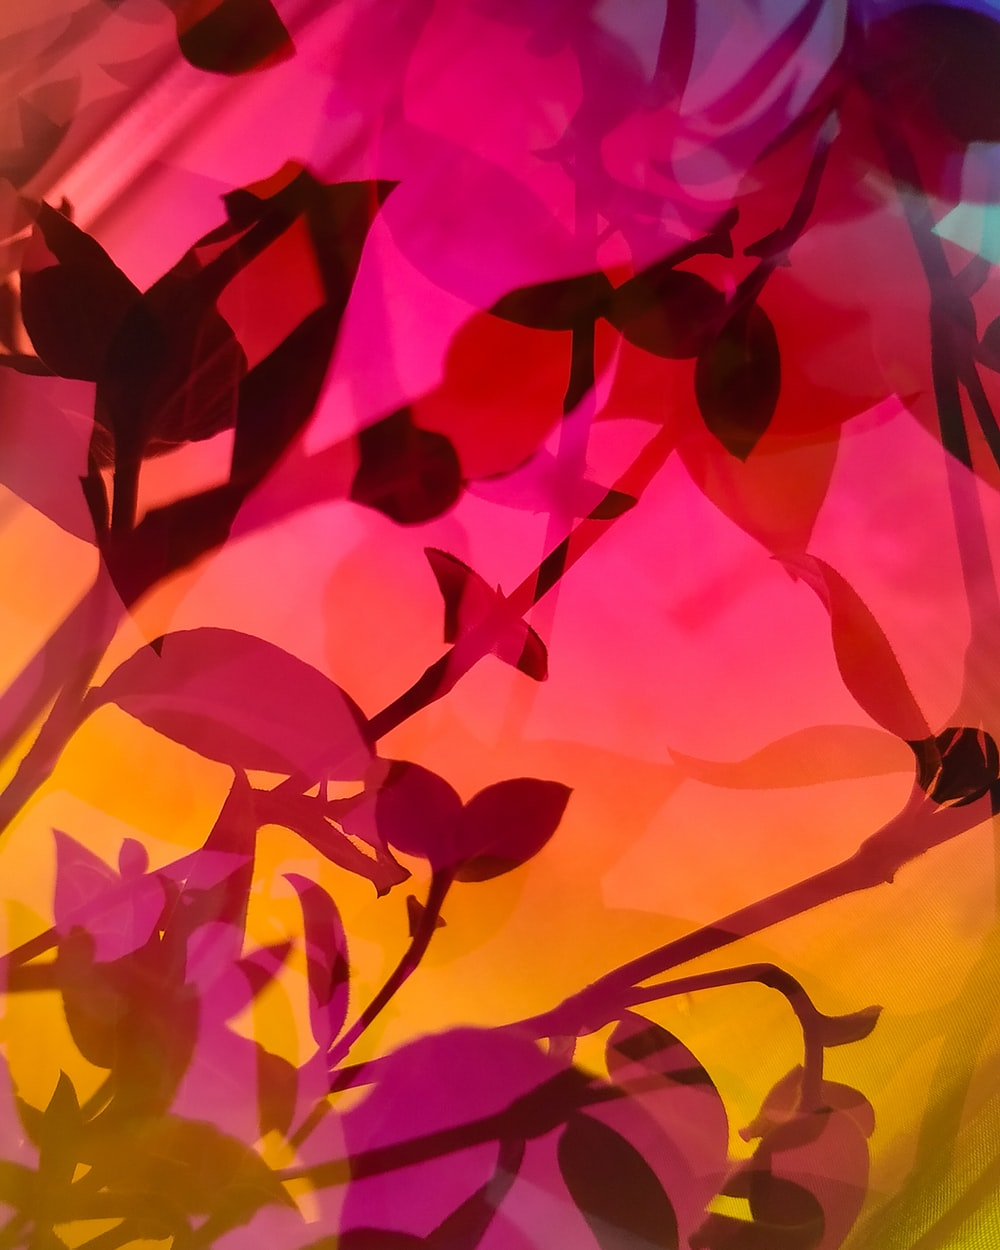 closeup photo of flowers